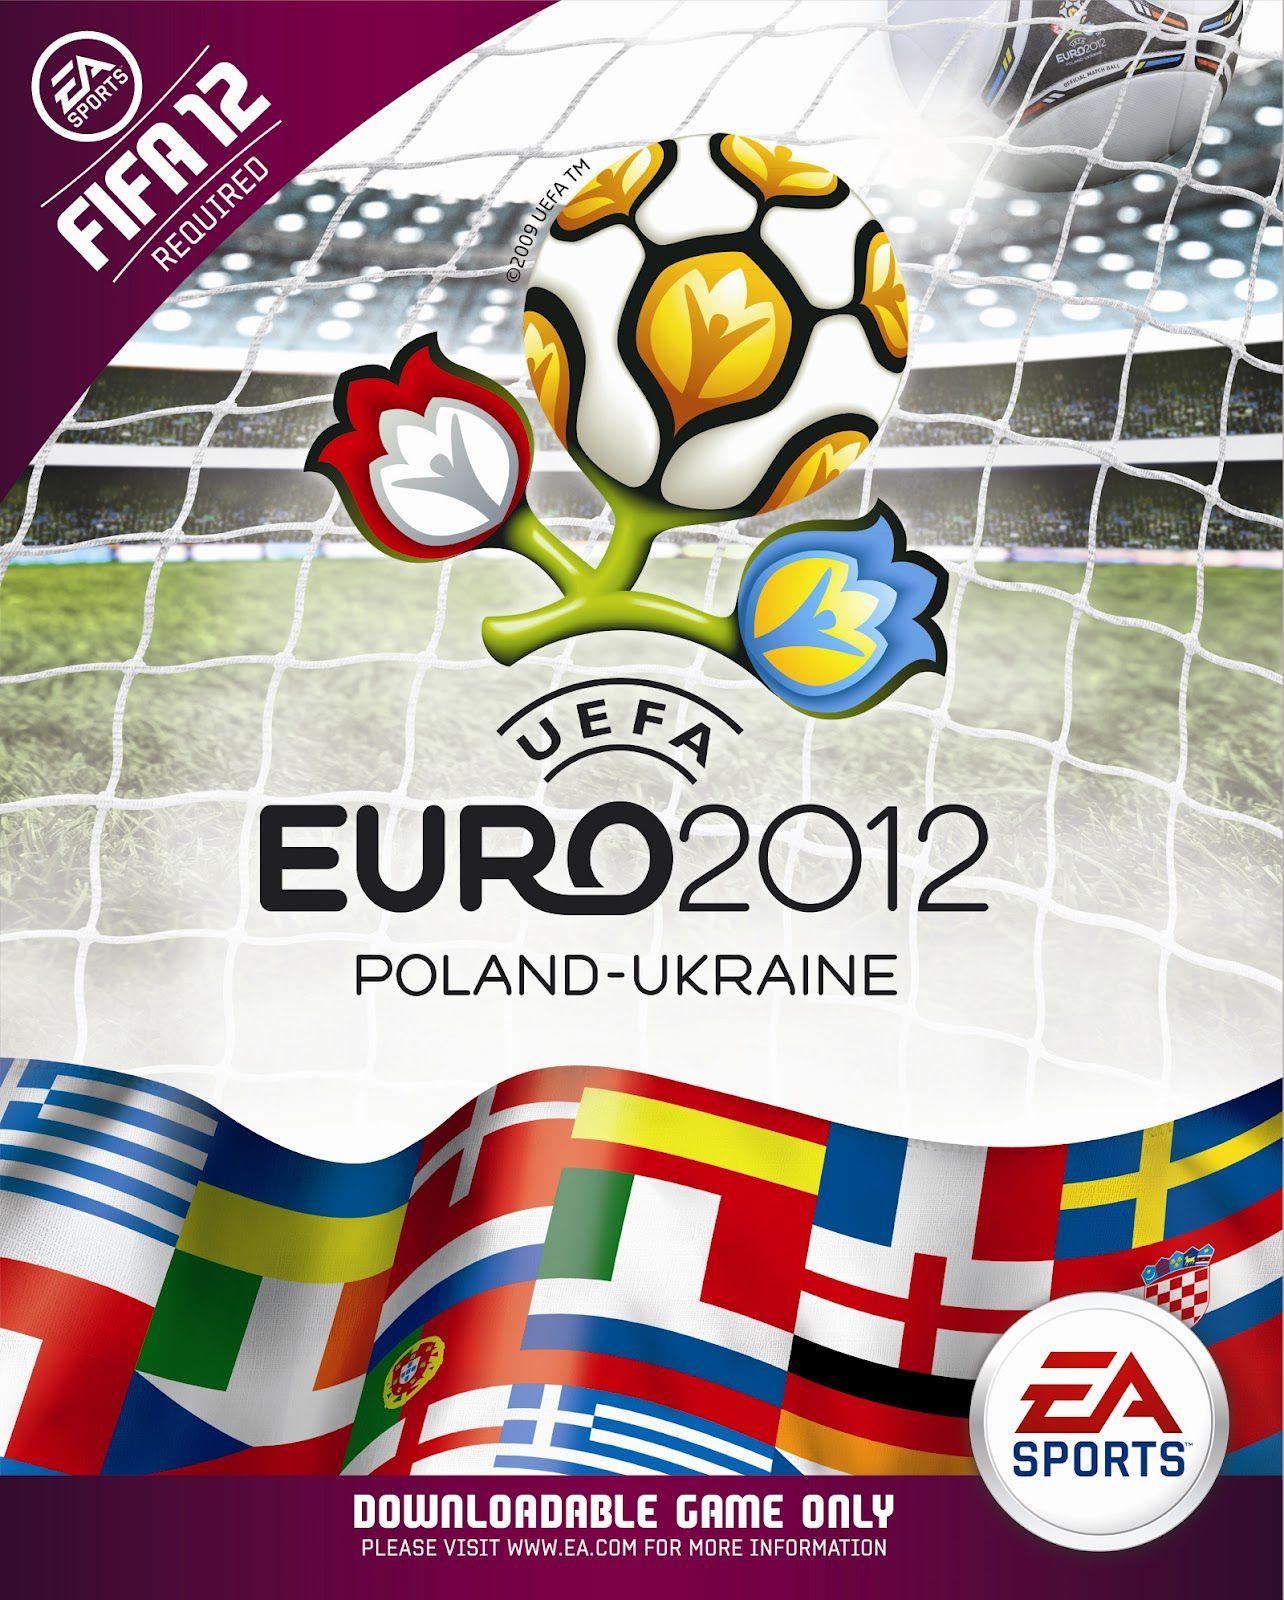 UEFA EURO 2012 – SKIDROW [Full ISO│Sports│2012]